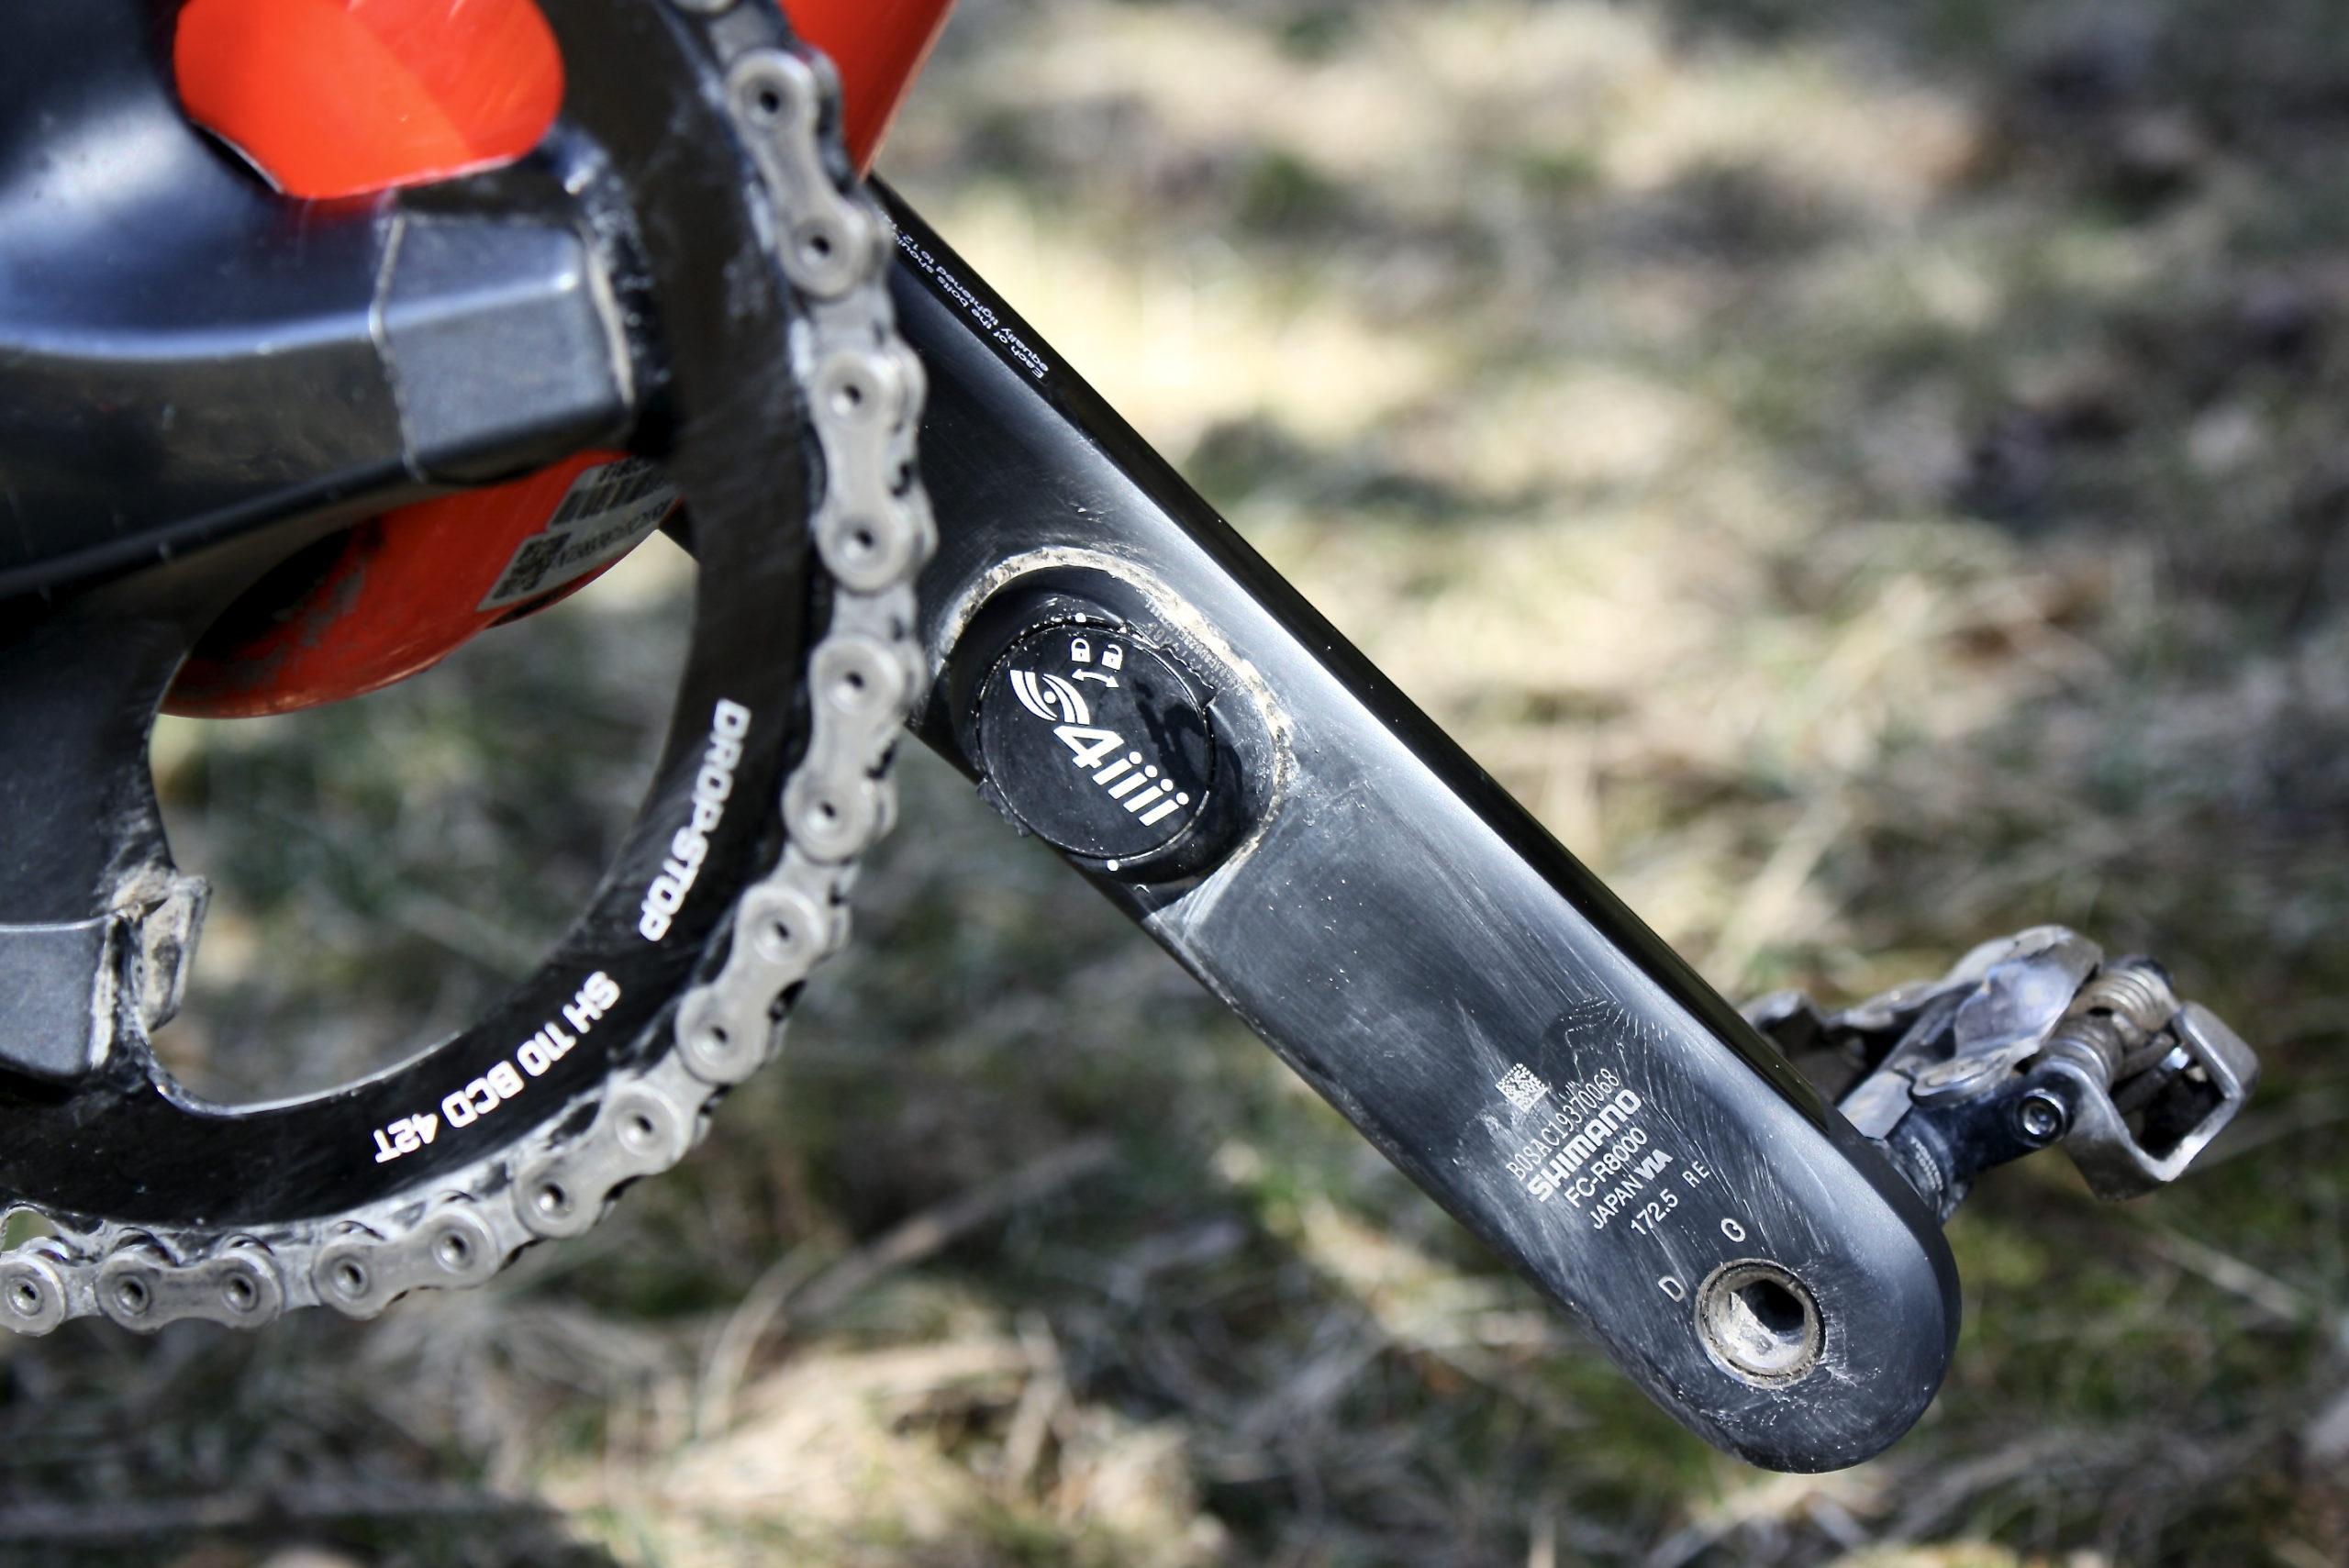 Best Mountain bike power meters 4iii Installed